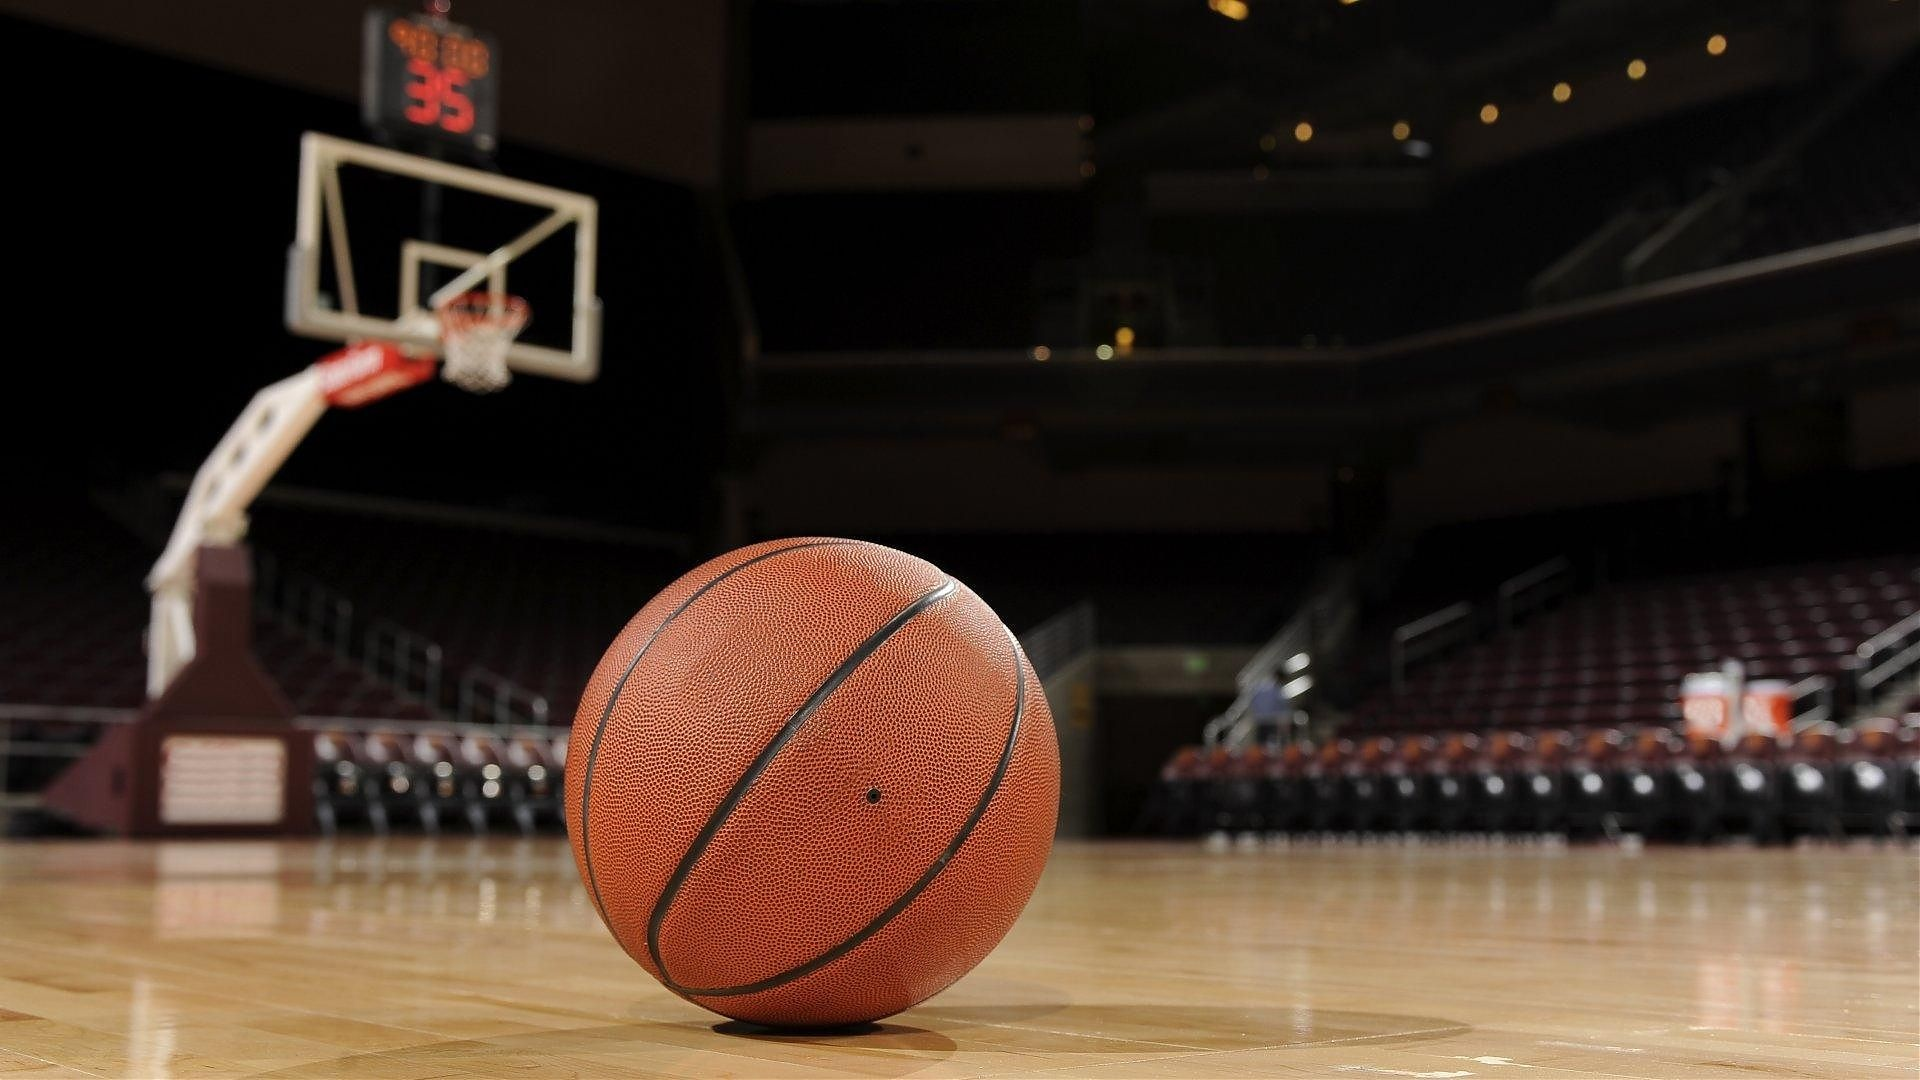 Basketball windows background